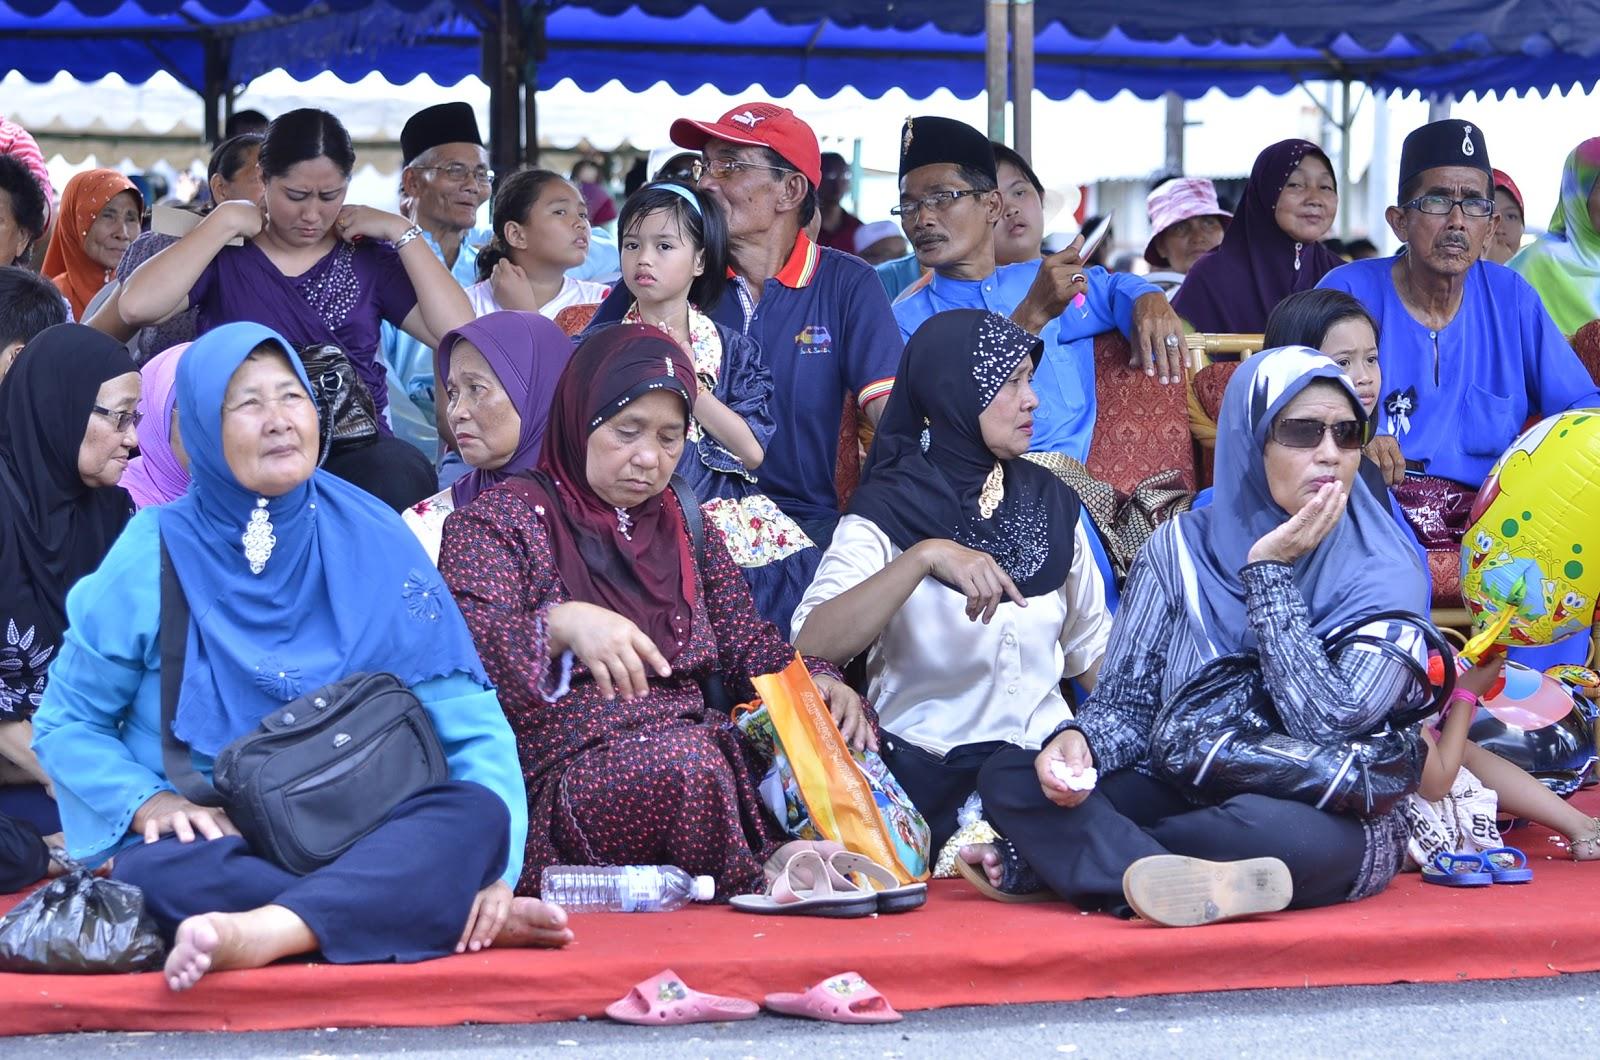 sri aman muslim Kuching: a total of 1,027 muslim pilgrims were selected for the haj to the holy land this year these pilgrims came from kuching (661), miri (72), sibu (56), limbang / lawas (22), sri aman (50), sarikei (67), bintulu (64) and mukah (35.